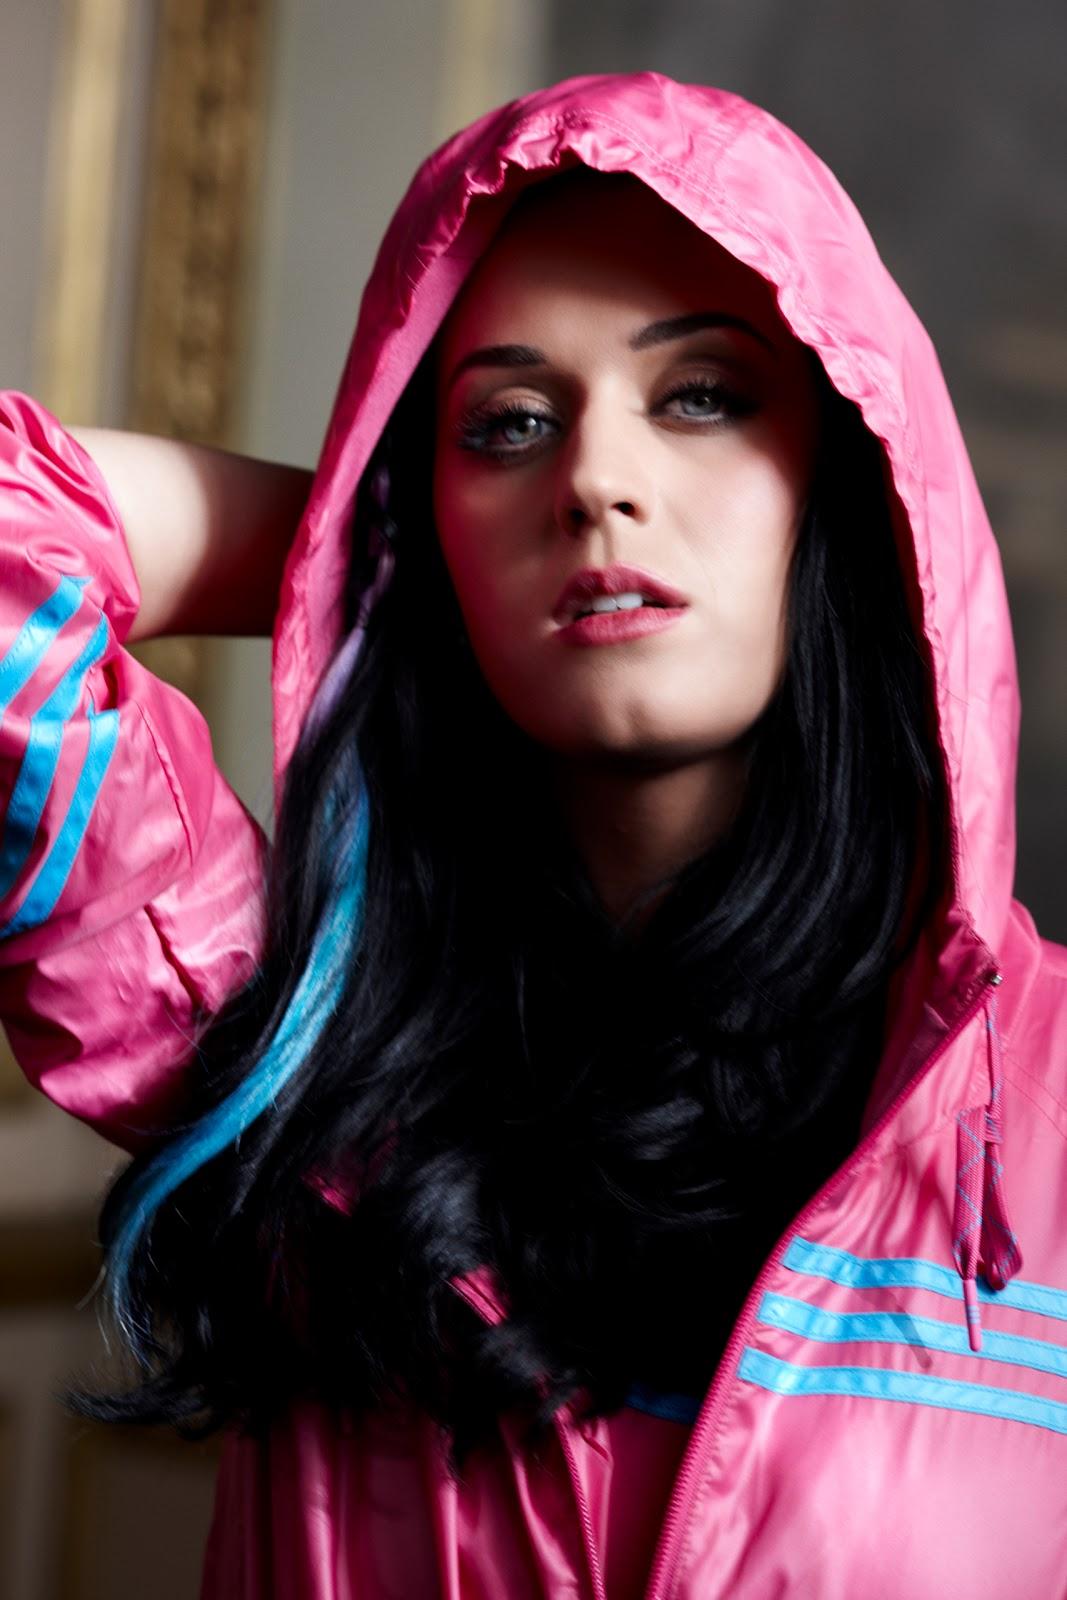 http://4.bp.blogspot.com/-4HaBJFxSt80/TjpYBTfAMiI/AAAAAAAABLs/3PI1YKLGH4E/s1600/Katy-Perry-in-adidas-advertisement.jpg